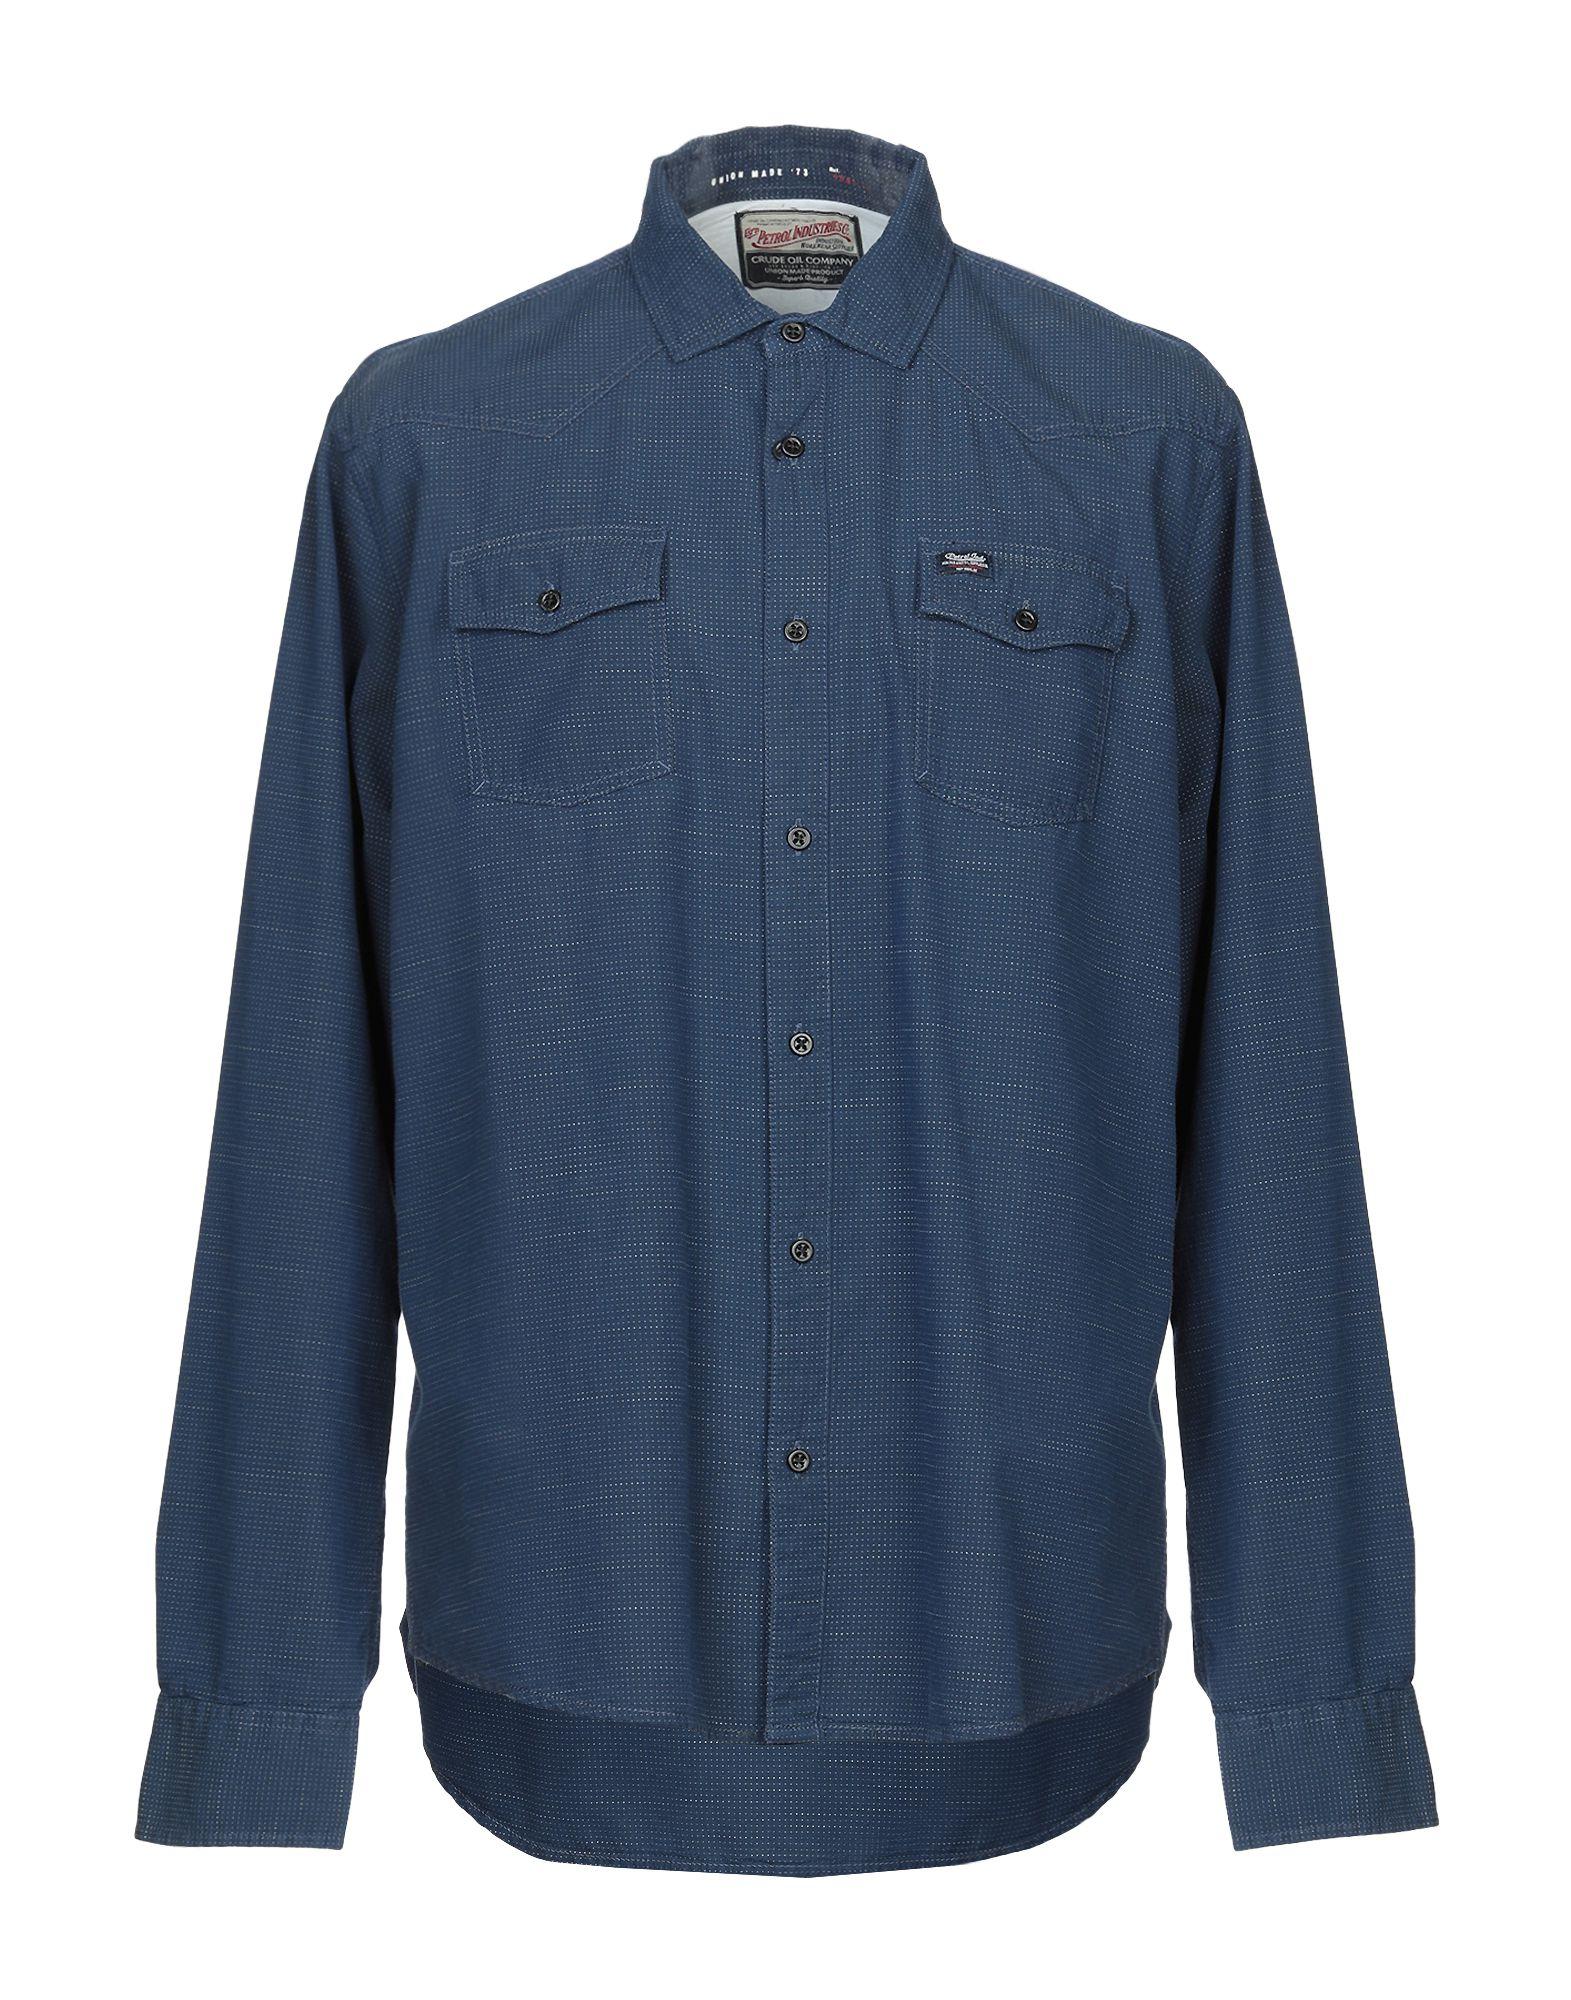 PETROL INDUSTRIES Co. Pубашка цена